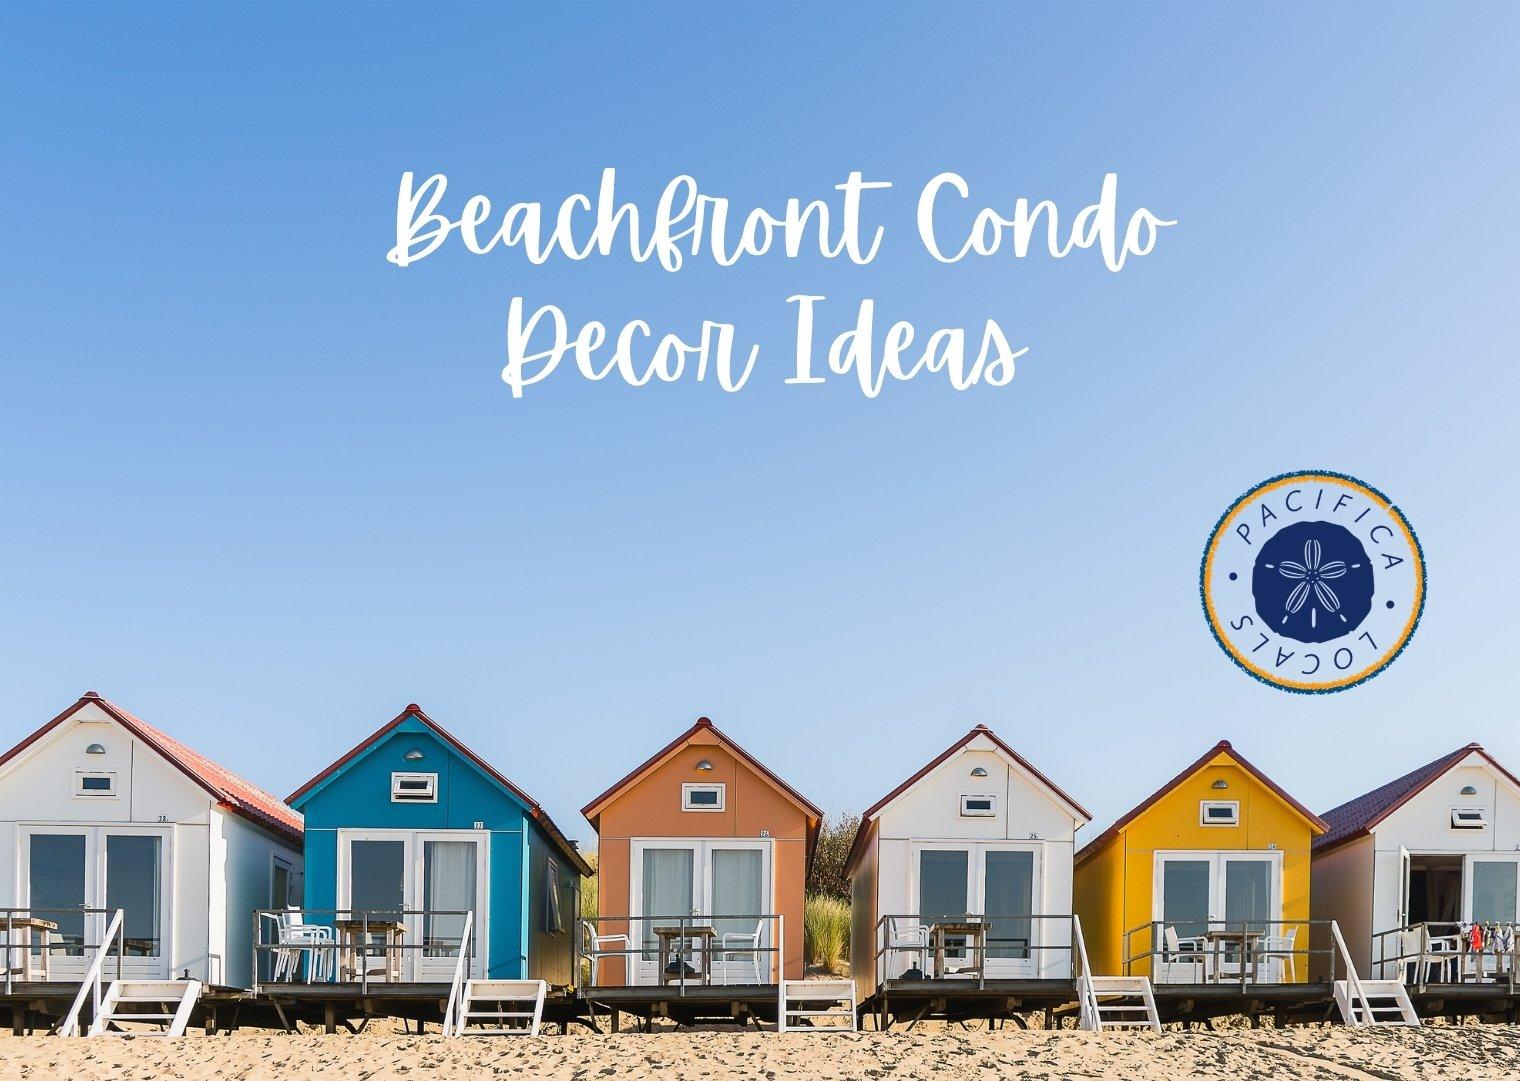 row of colorful tiny houses with text beachfront condo decor ideas